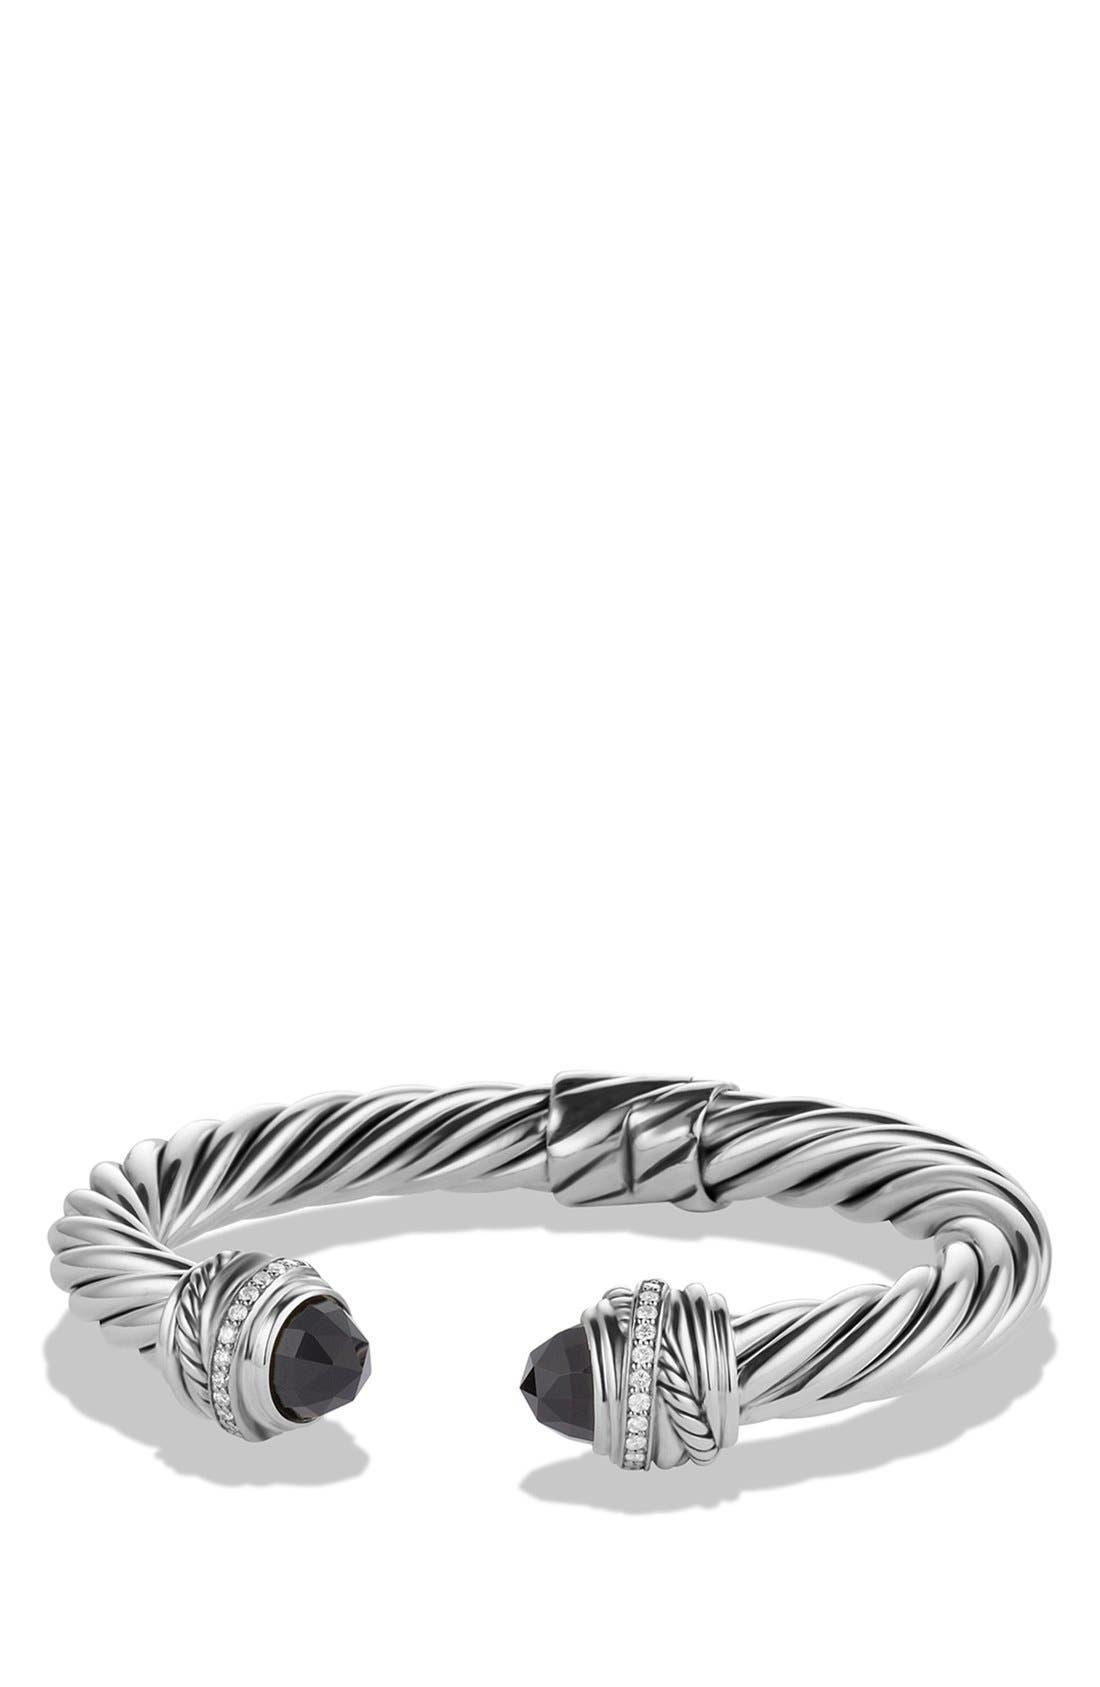 'Cable Classics' Bracelet with Semiprecious Stones & Diamonds,                             Main thumbnail 1, color,                             001